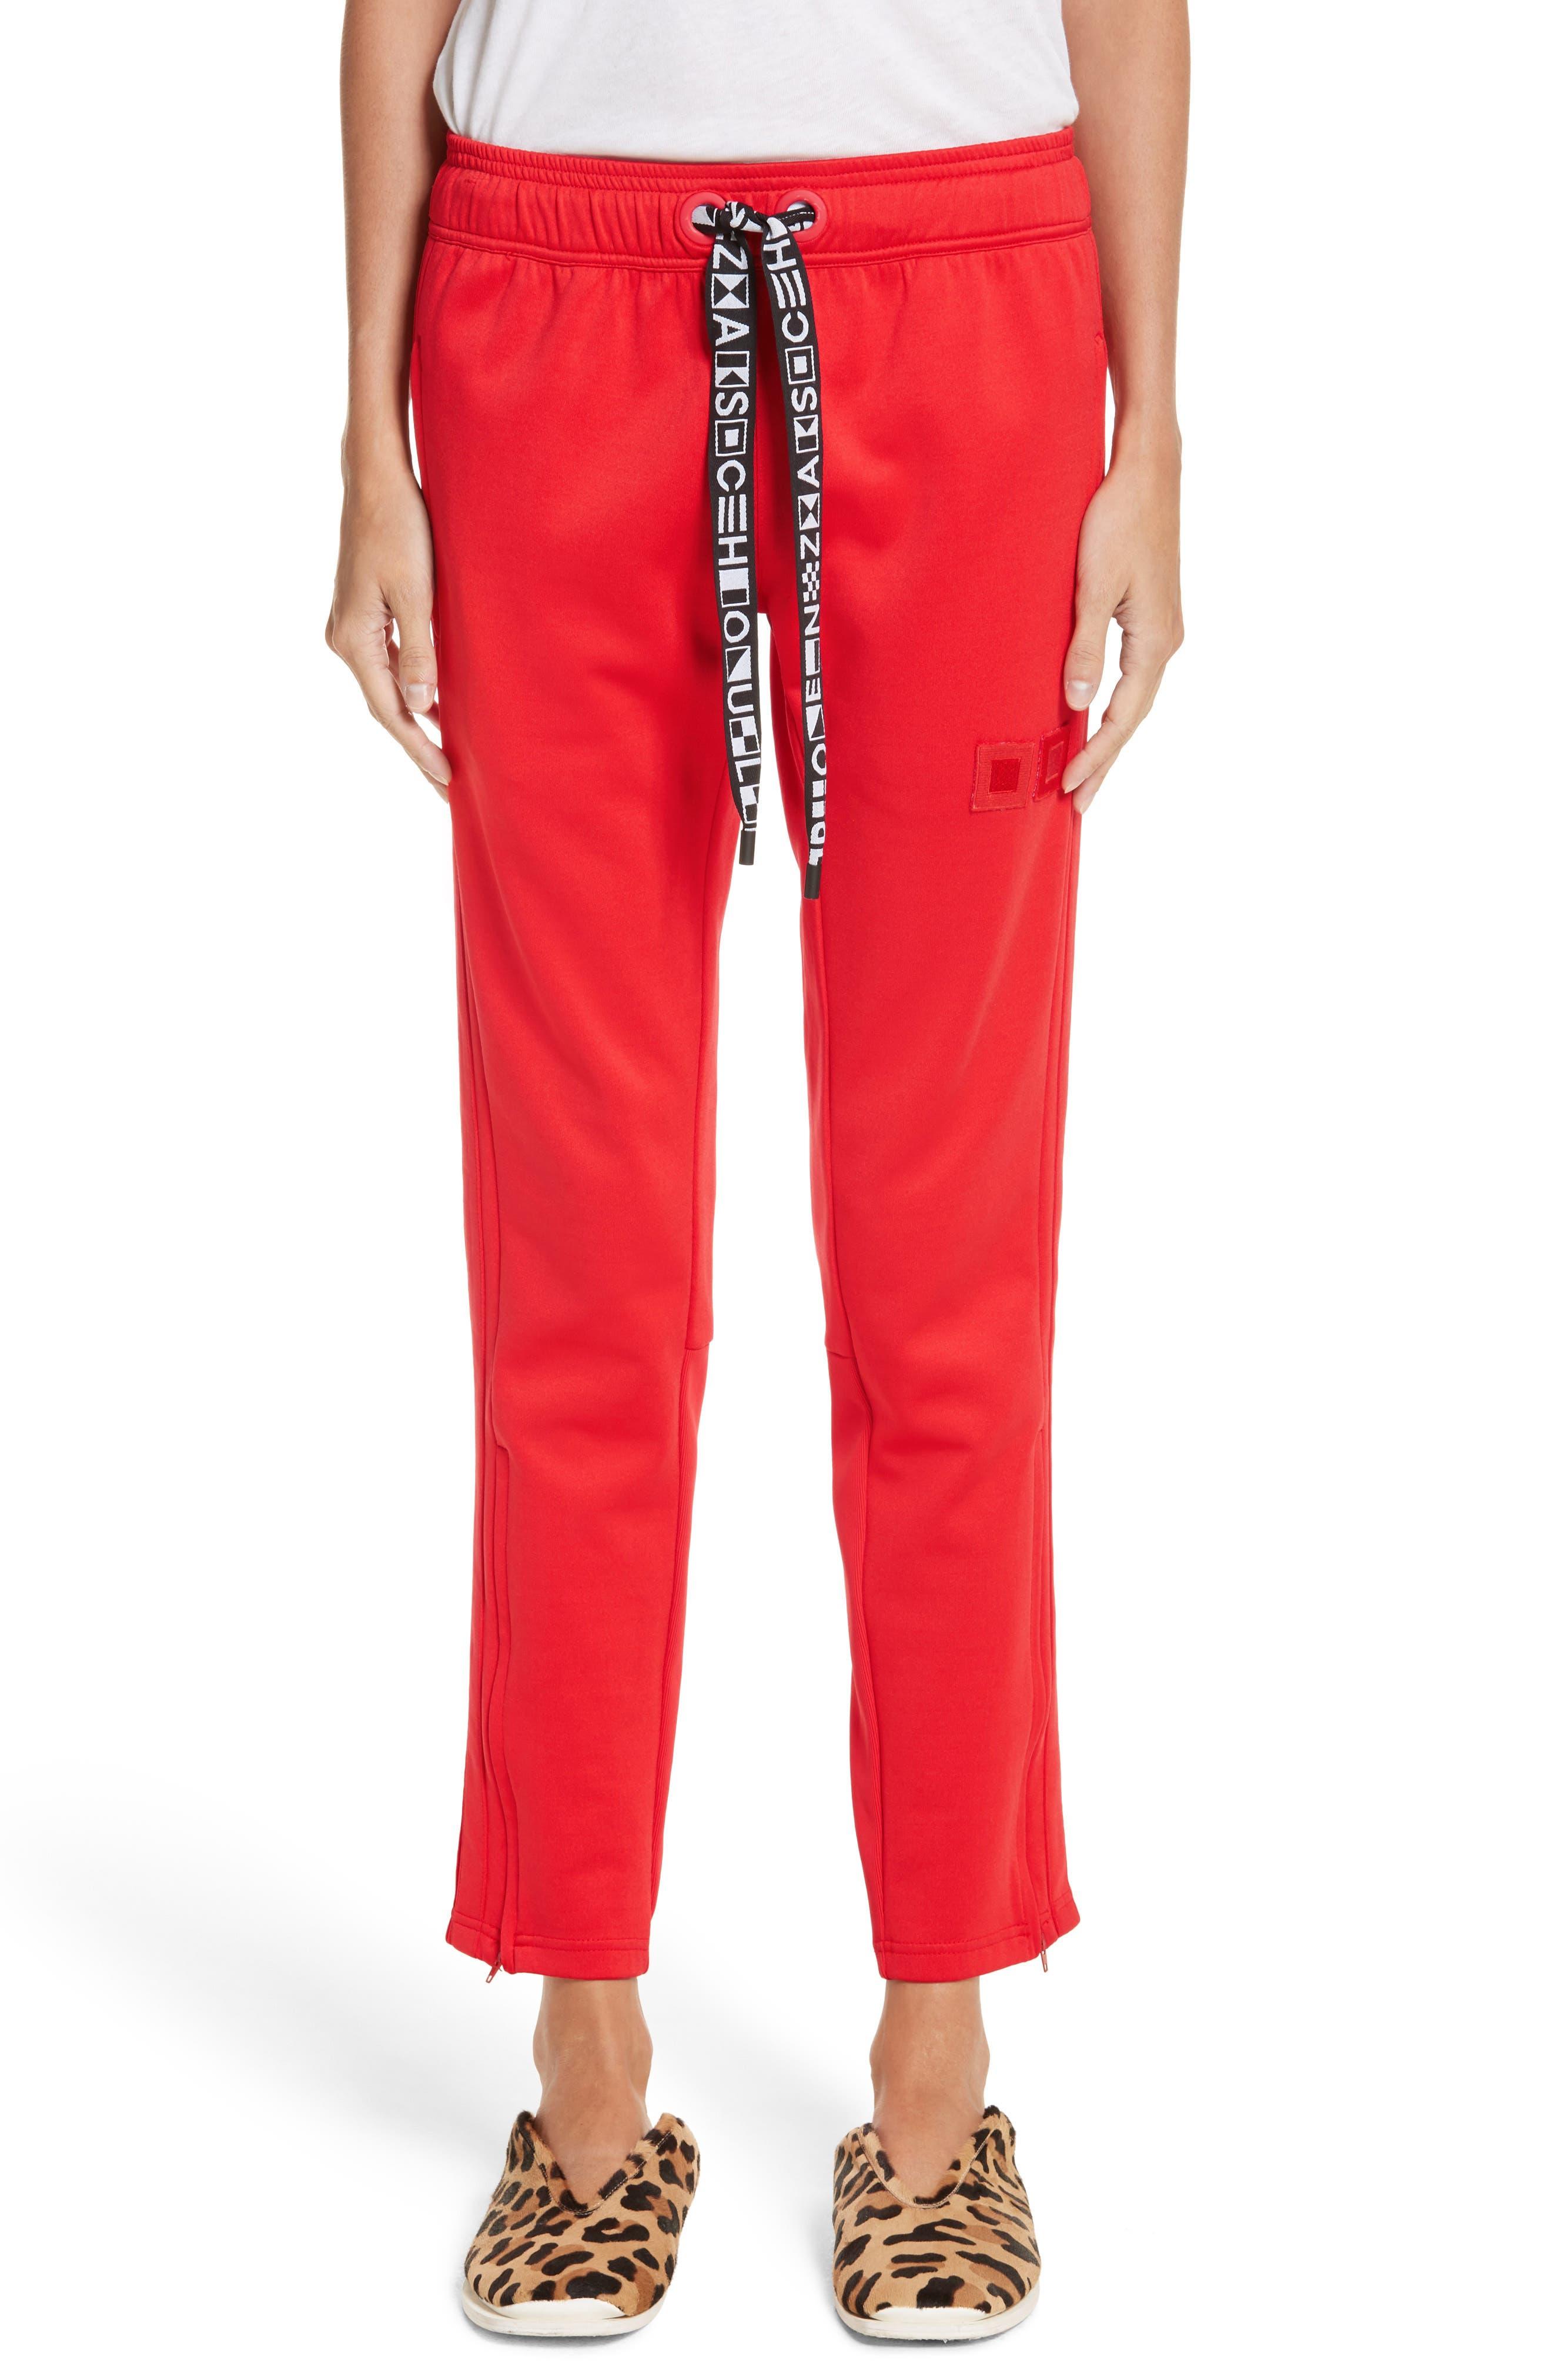 PSWL Jersey Track Pants,                         Main,                         color, Poppy